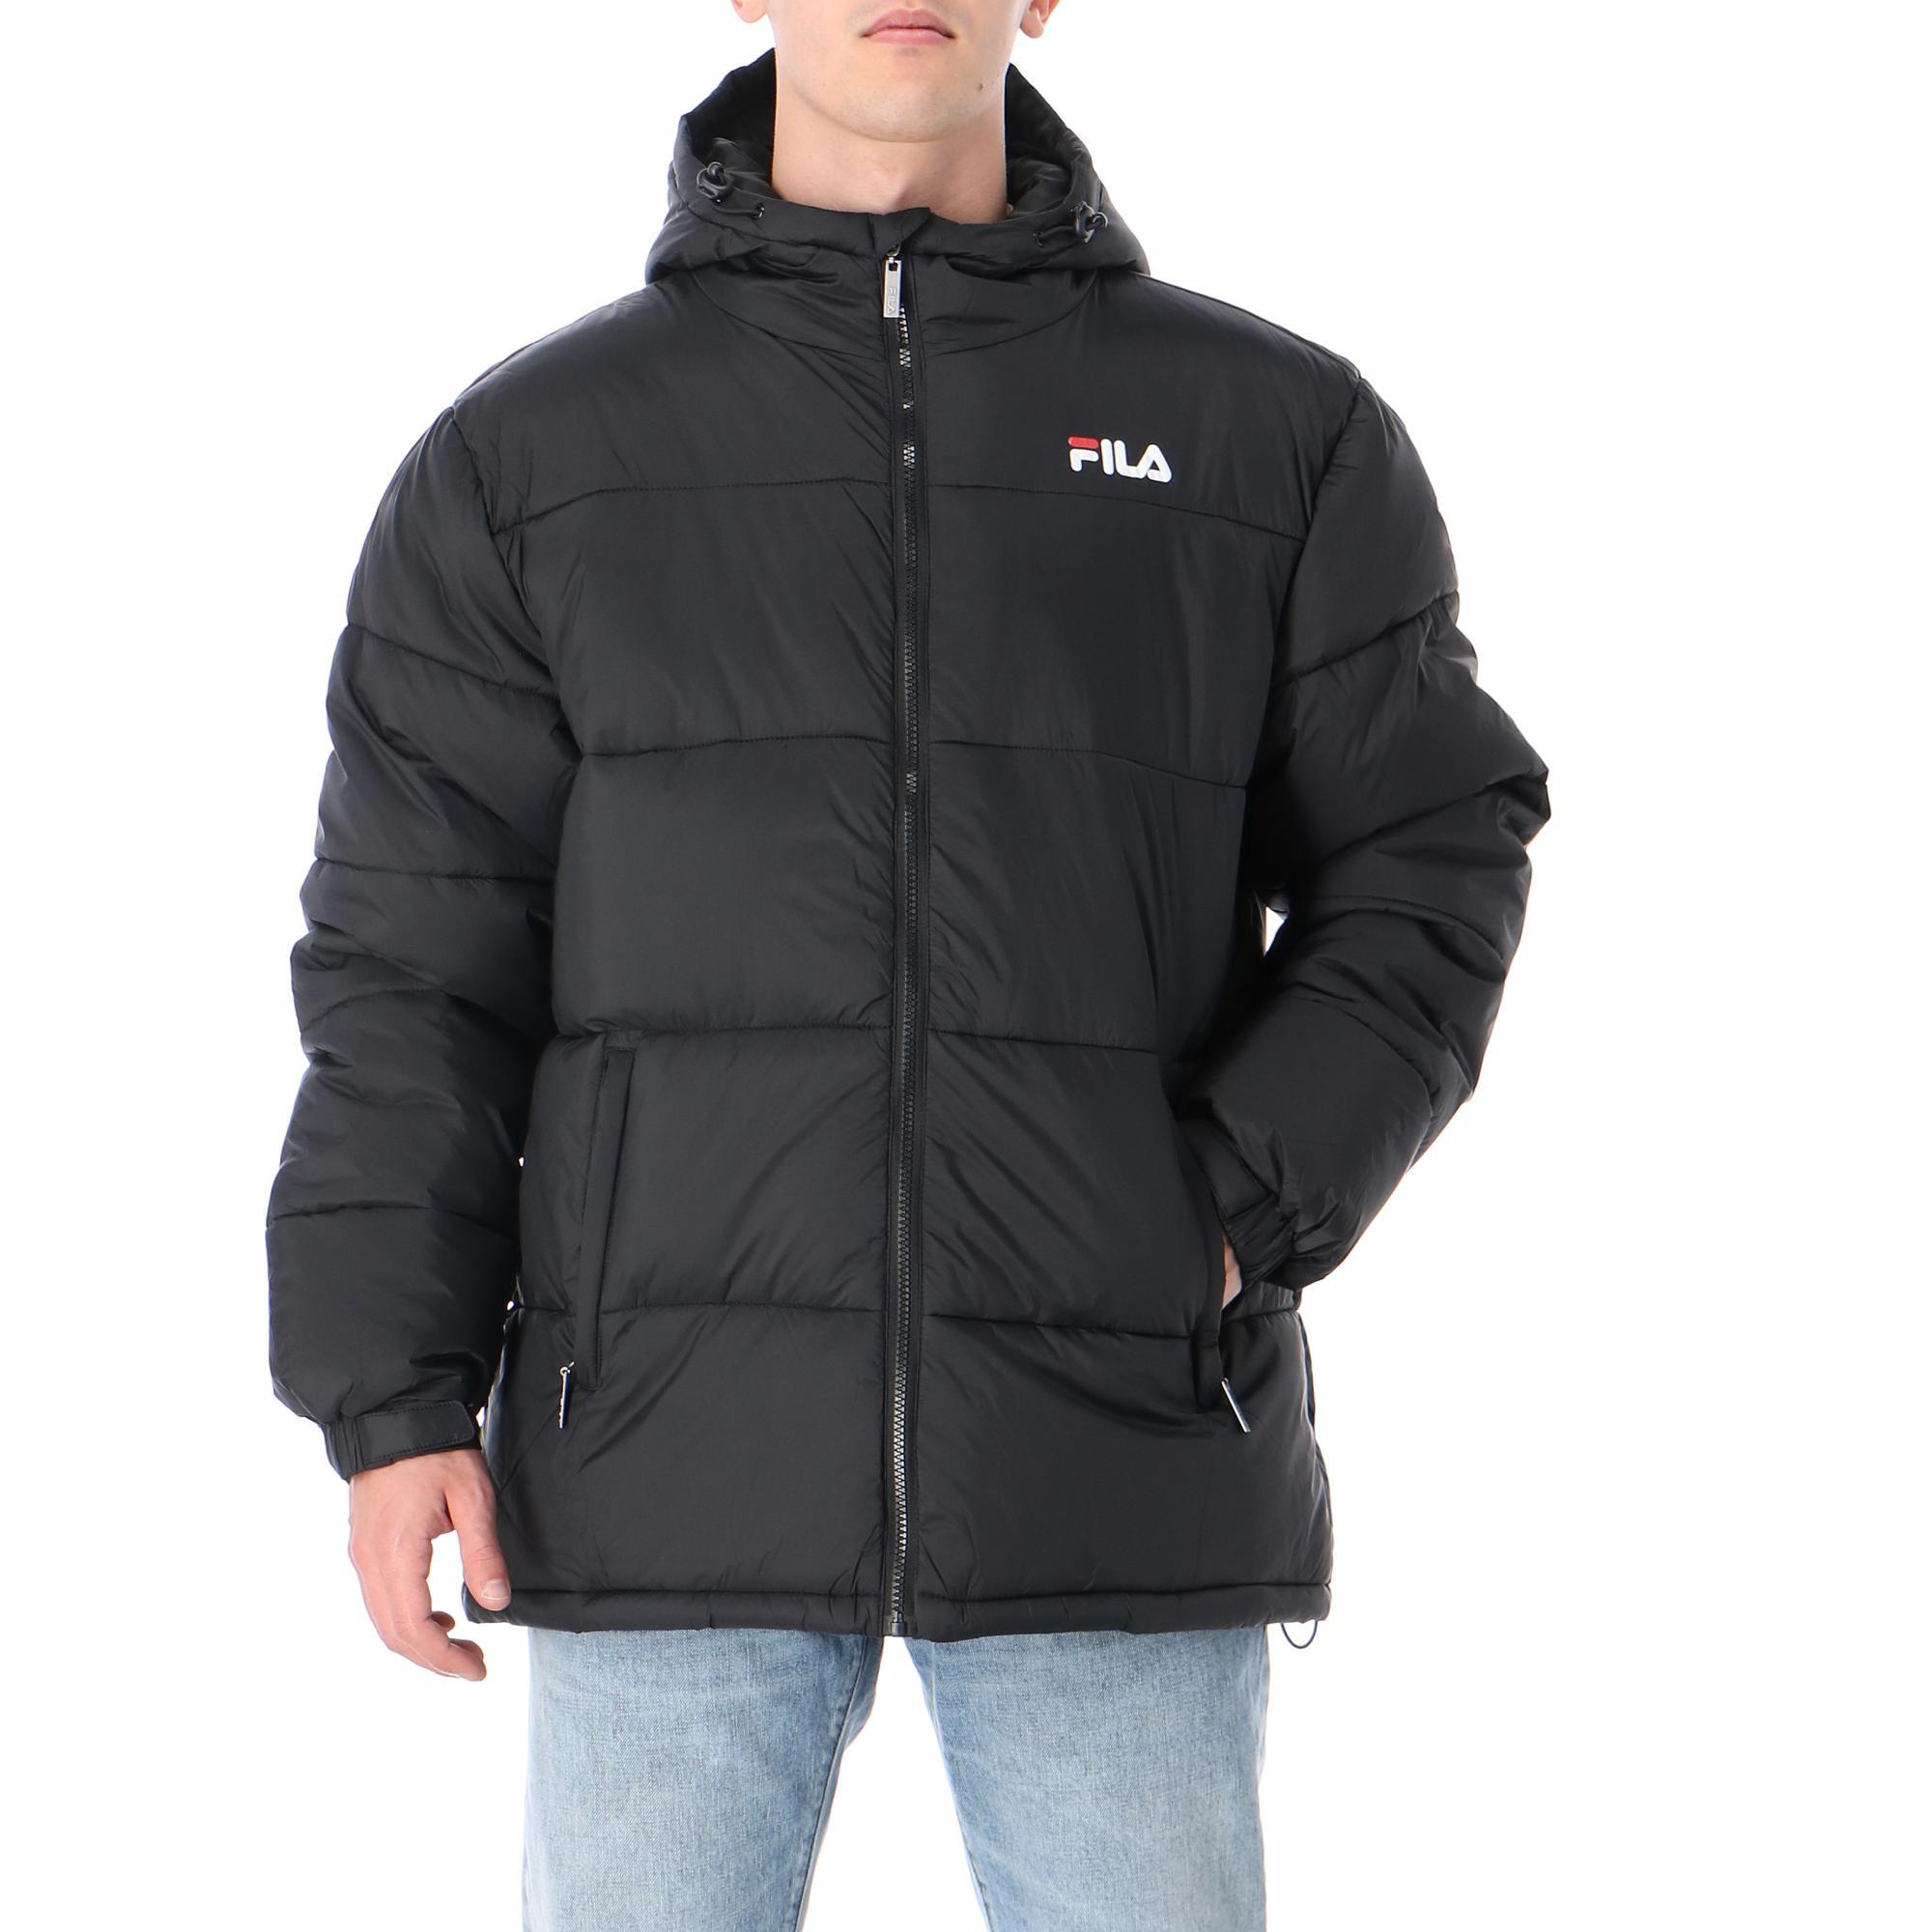 Fila Scooter Puffer Jacket Black